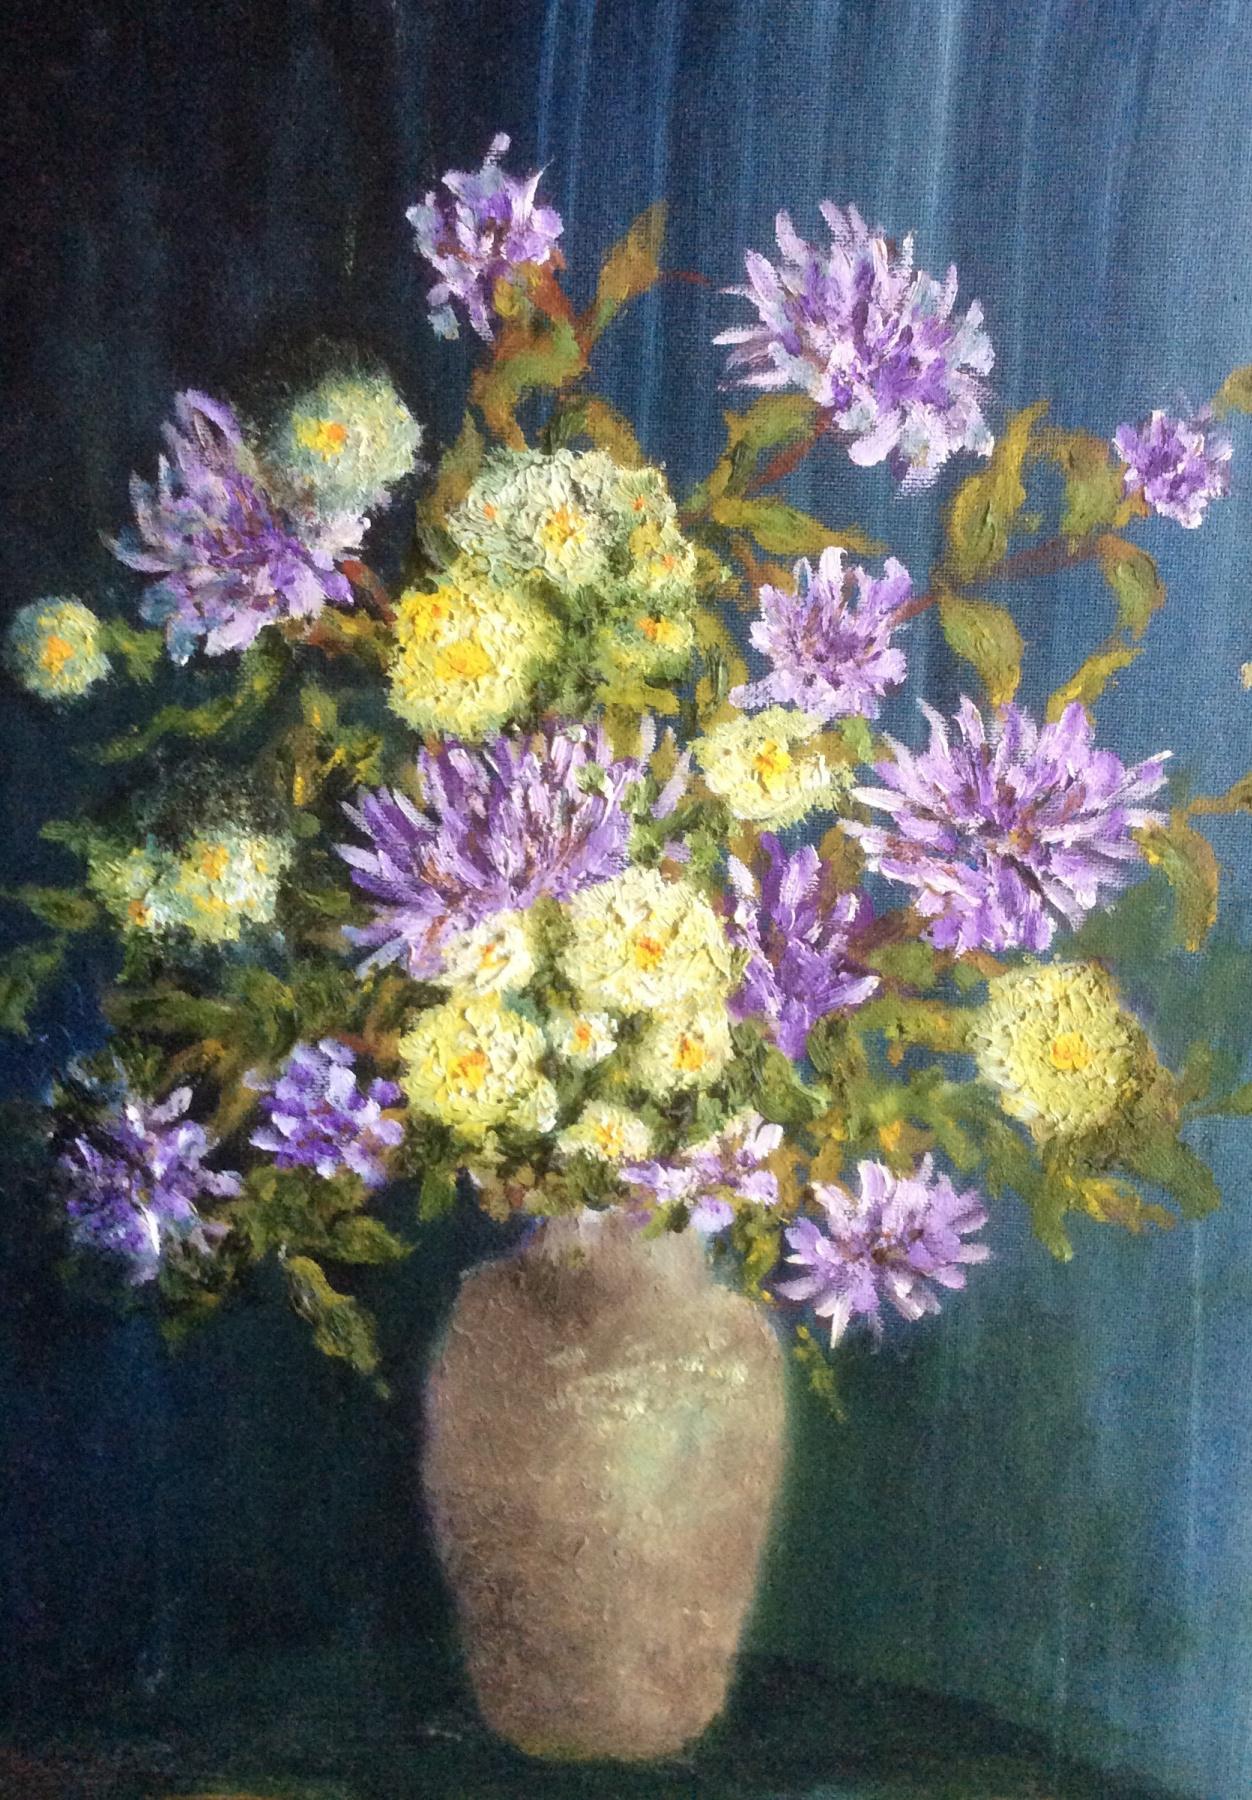 Rita Arkadievna Beckman. Bouquet in a Vase